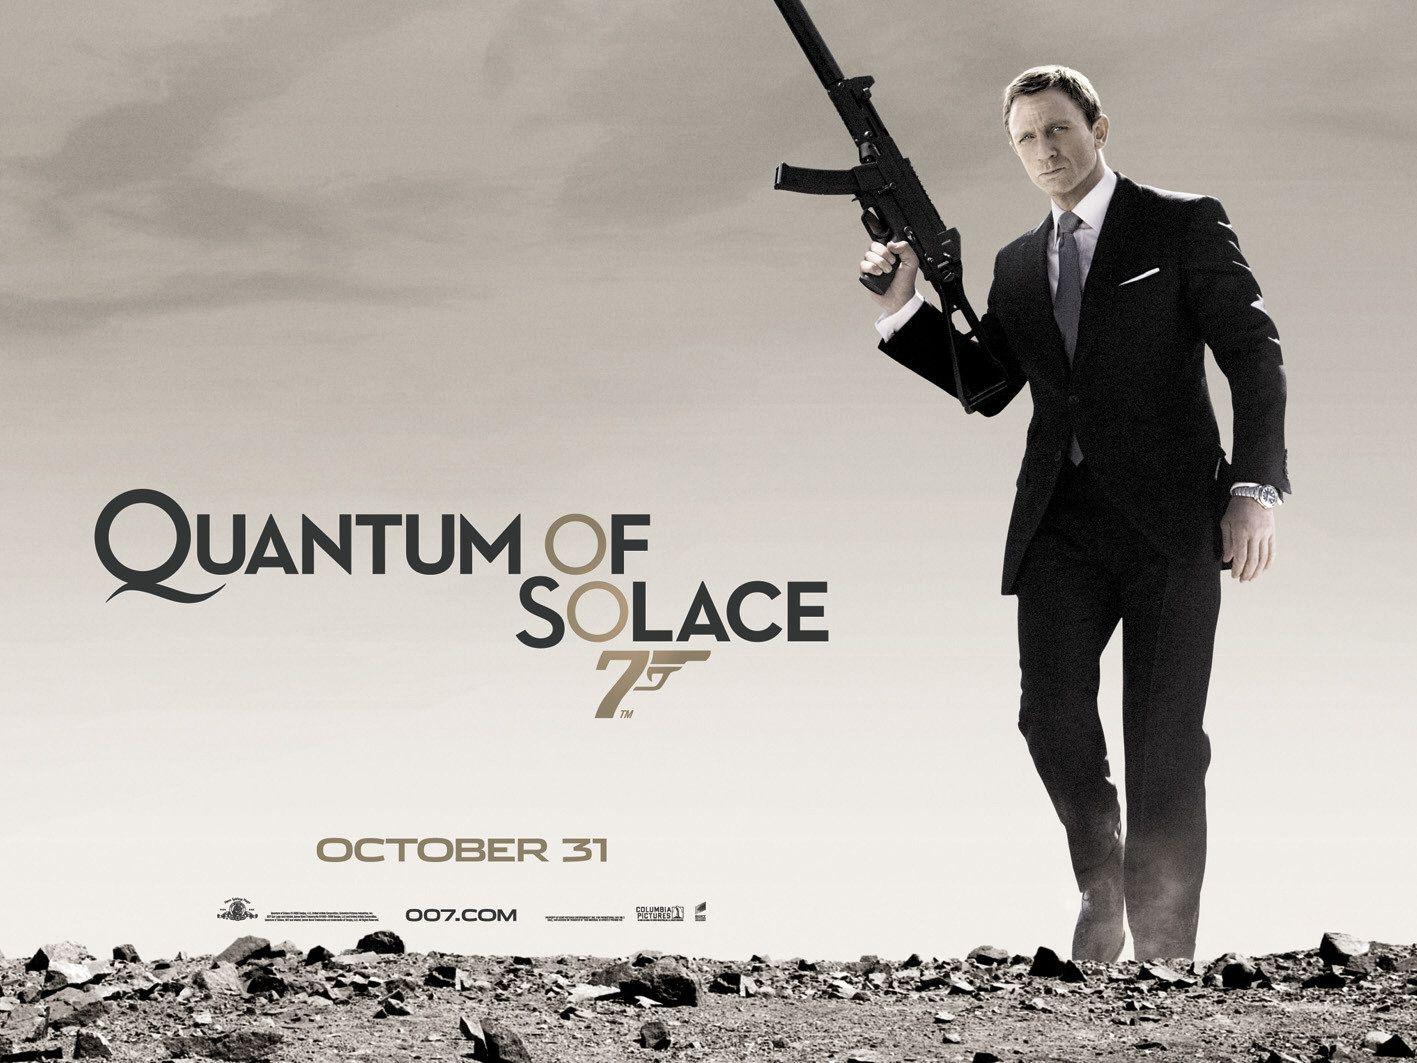 http://2.bp.blogspot.com/-wkajdeKLbTs/UJRaFDlnP5I/AAAAAAAACO8/0yGxS9Z2nLo/s1600/2008-quantum_of_solace-2.jpg